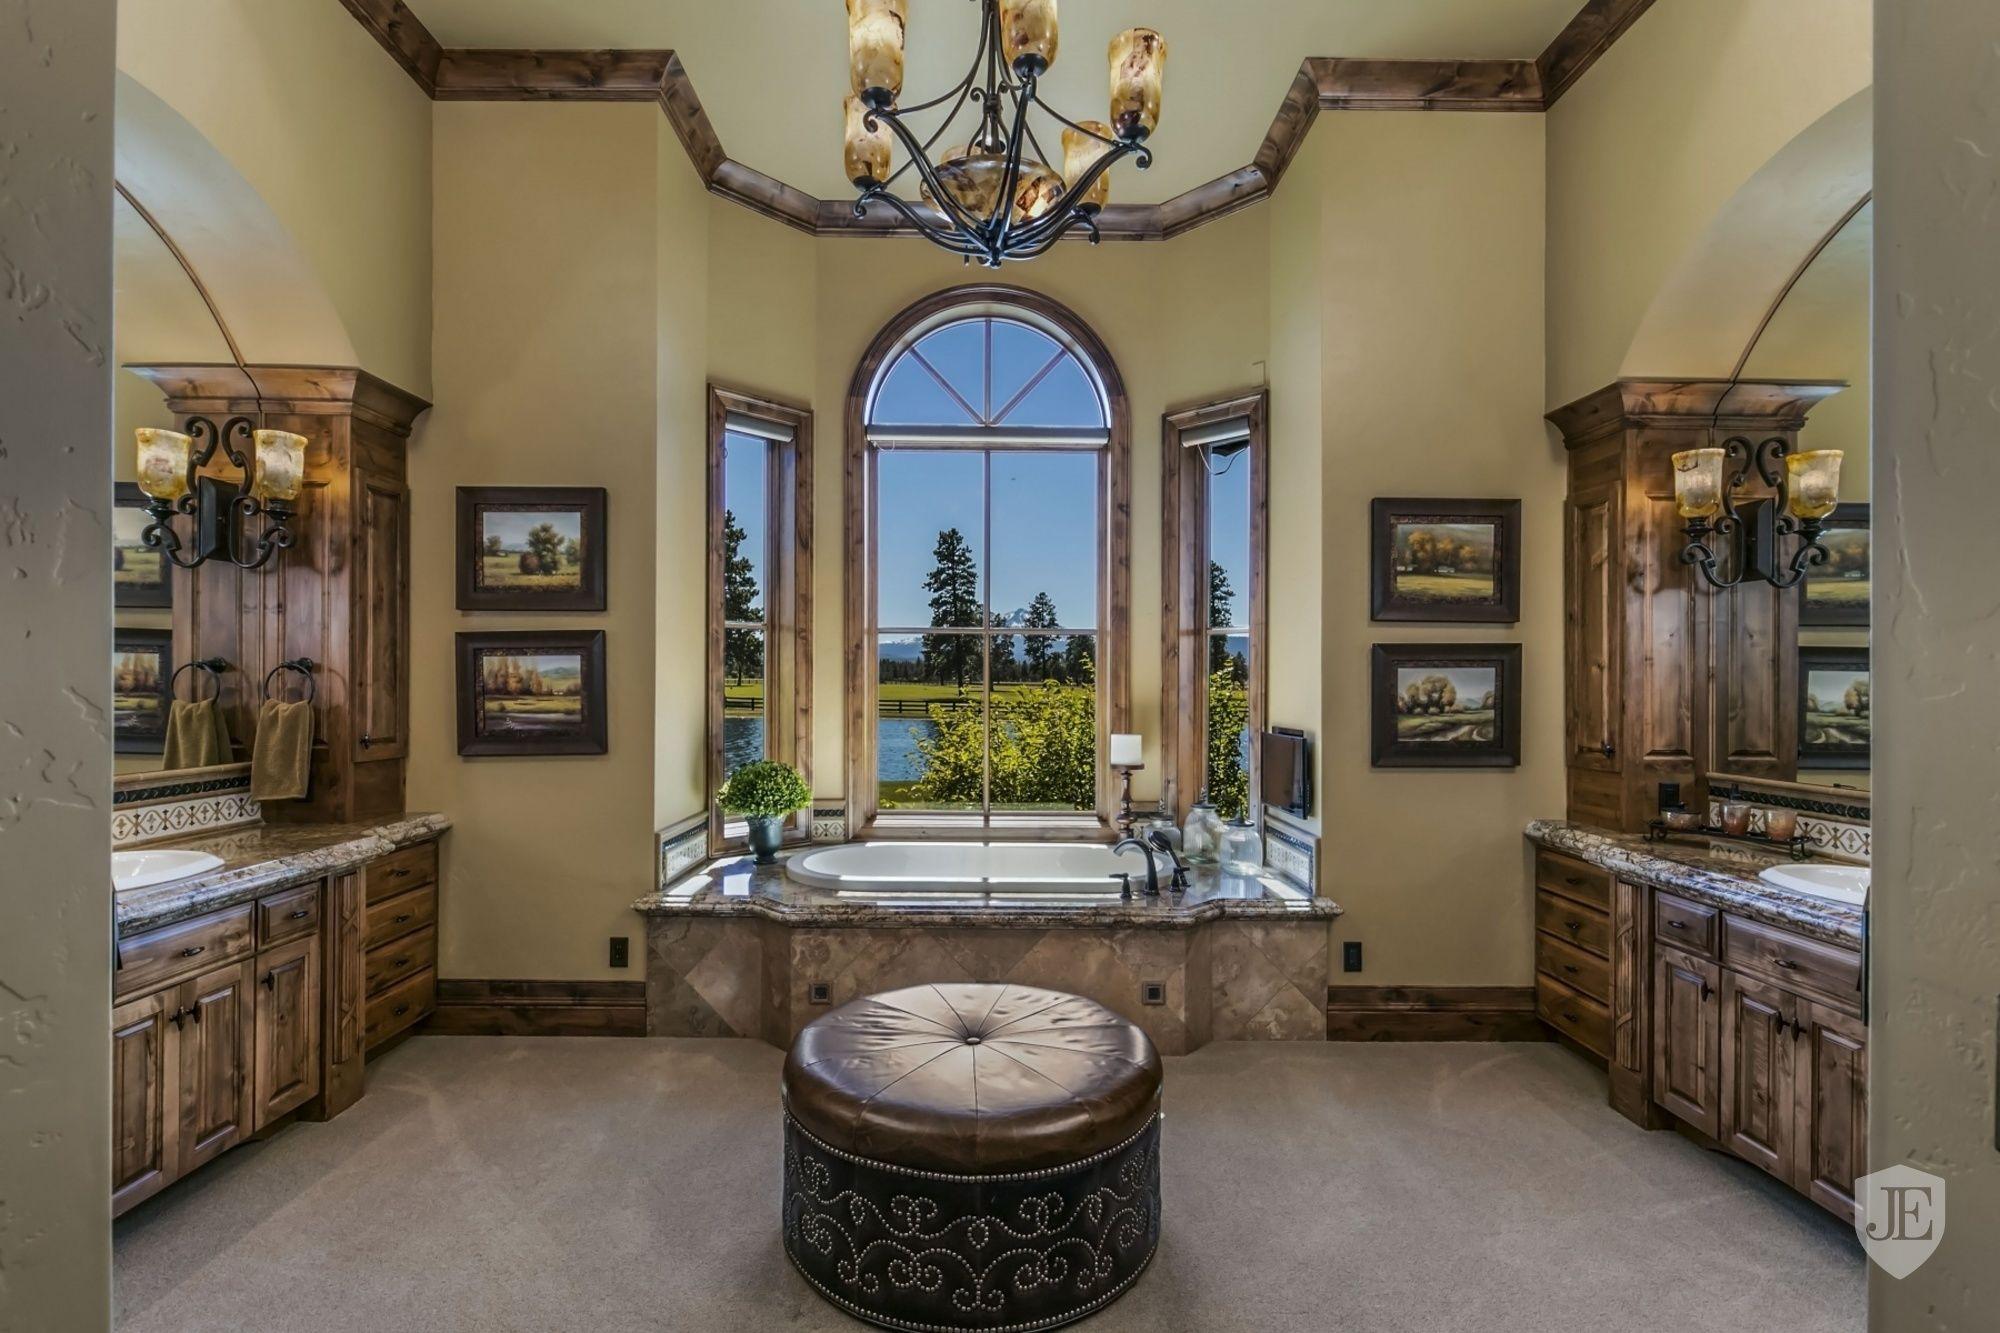 Pin by Cristy Mefferd on Bathroom Design & Decor | Luxury homes